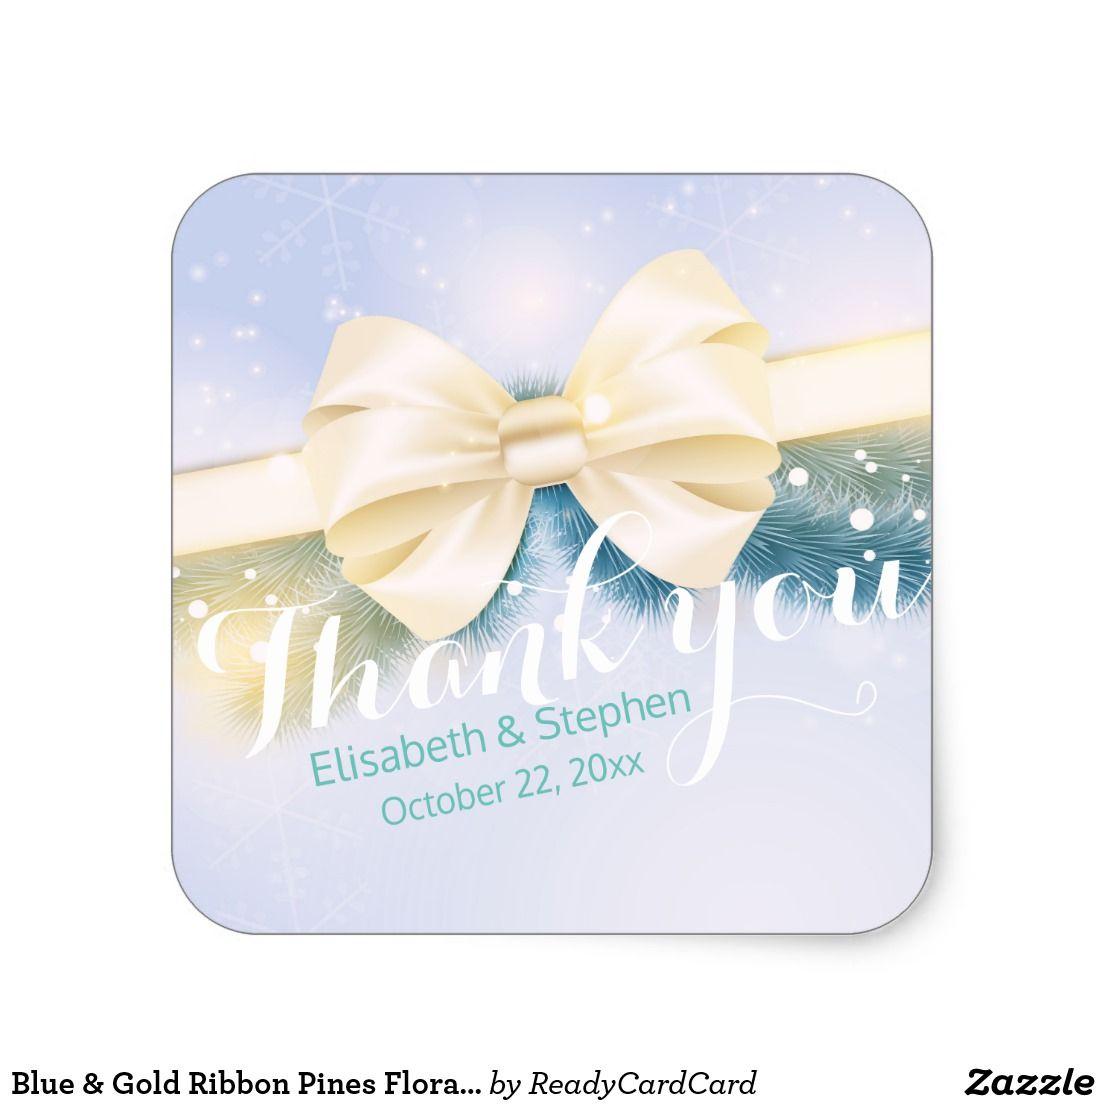 Blue Gold Ribbon Pines Fl Wedding Thank You Square Sticker Elegant Vintage Modern Chic